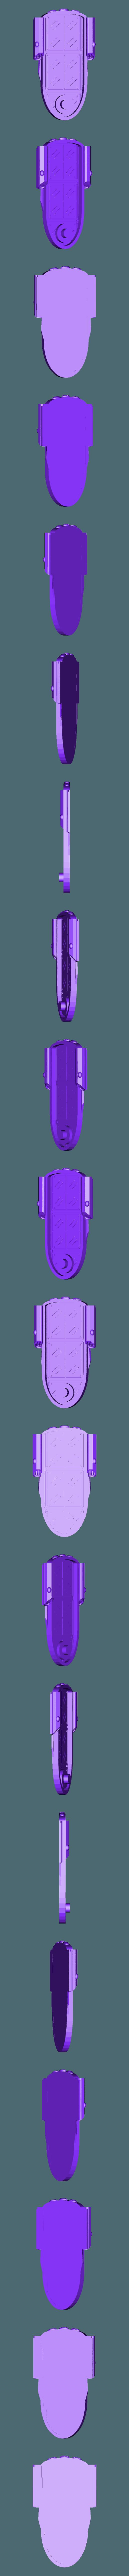 Minimal_Life_Raft.stl Download free STL file Minimal Star Ship • Design to 3D print, mrhers2